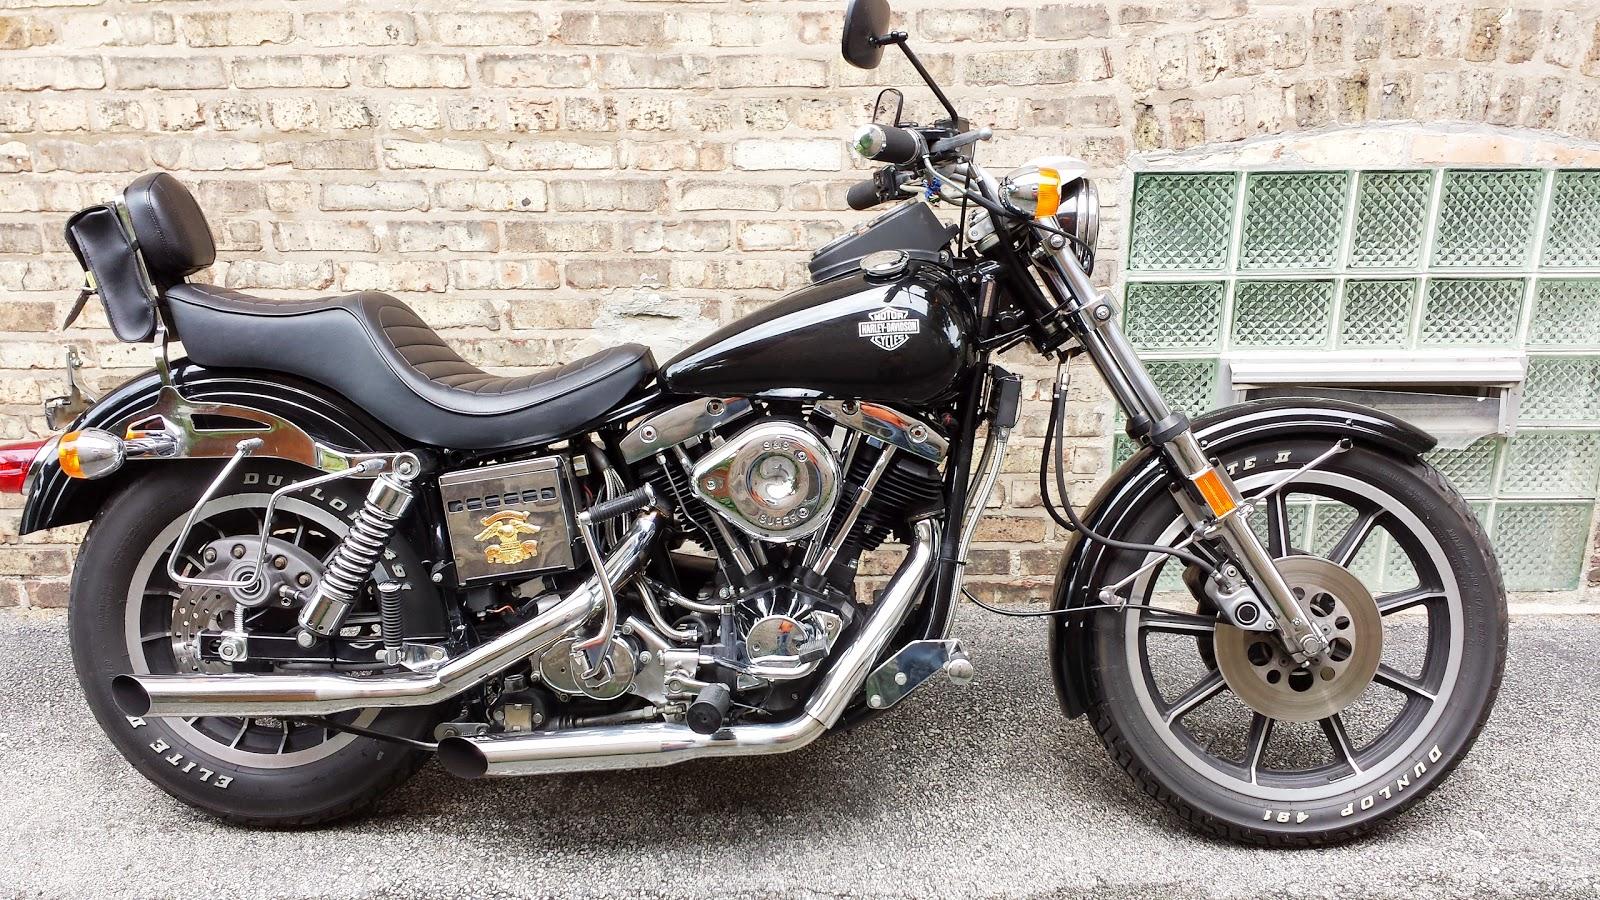 VINTAGE CYCLE GARAGE: 1979 Harley Davidson FXS-1200 Lowrider ...